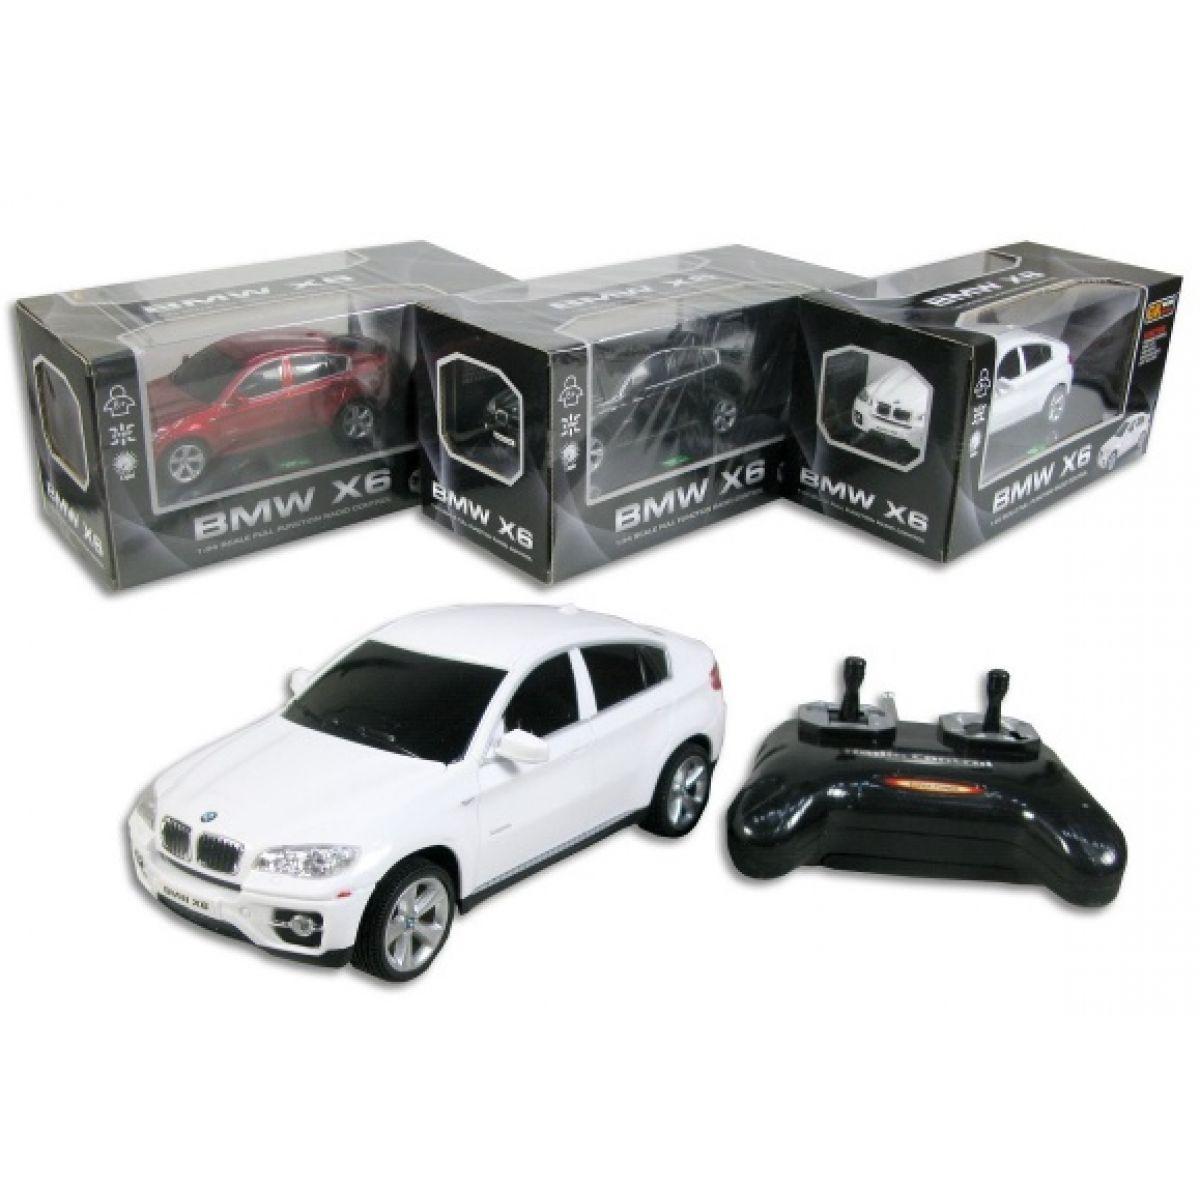 Made RC Auto BMW X6